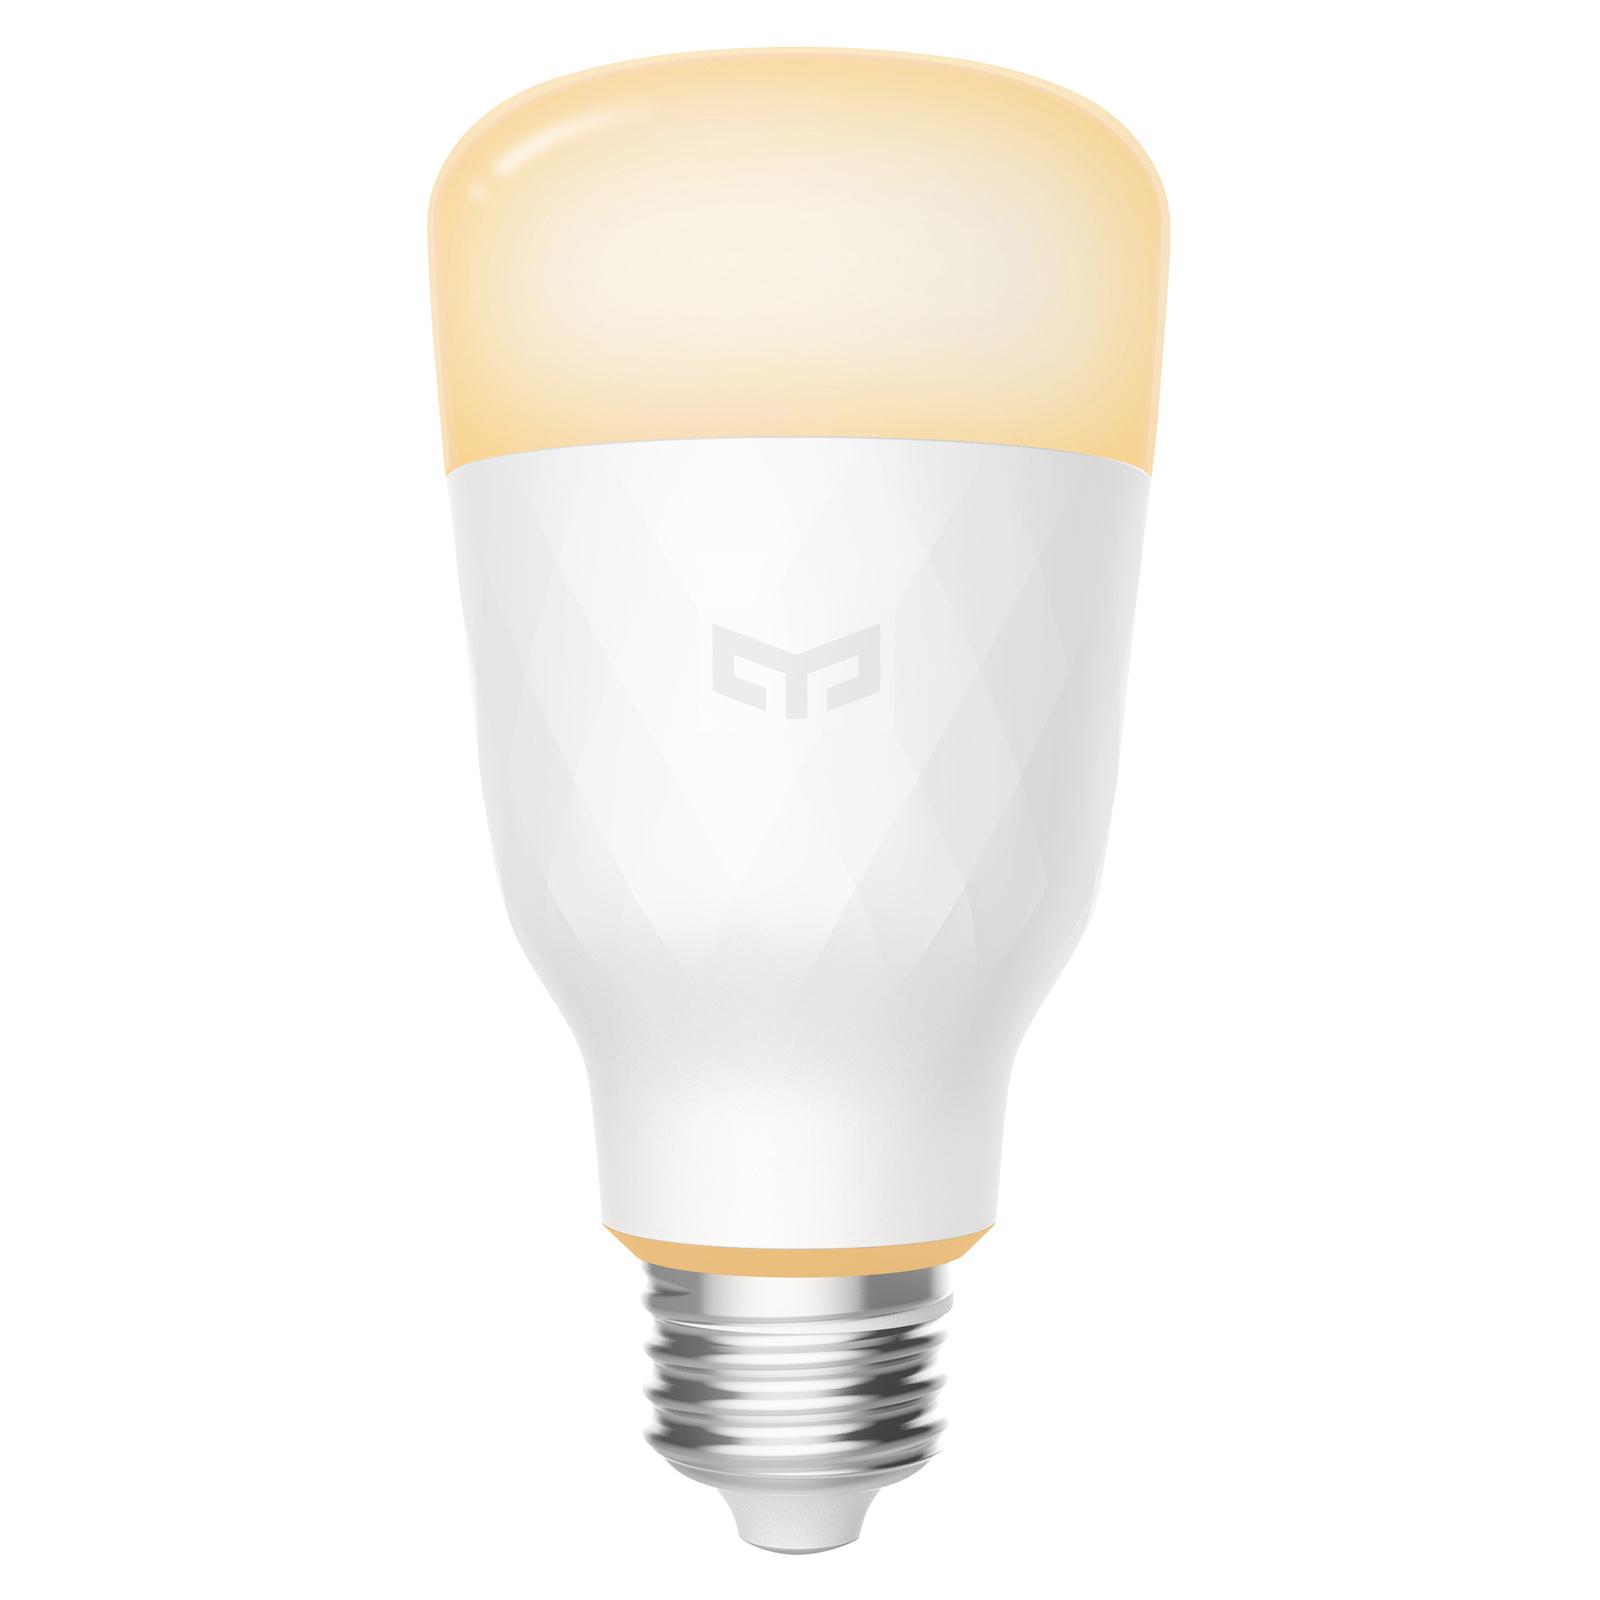 Yeelight Smart LED-lamppu E27 1S, 8,5W